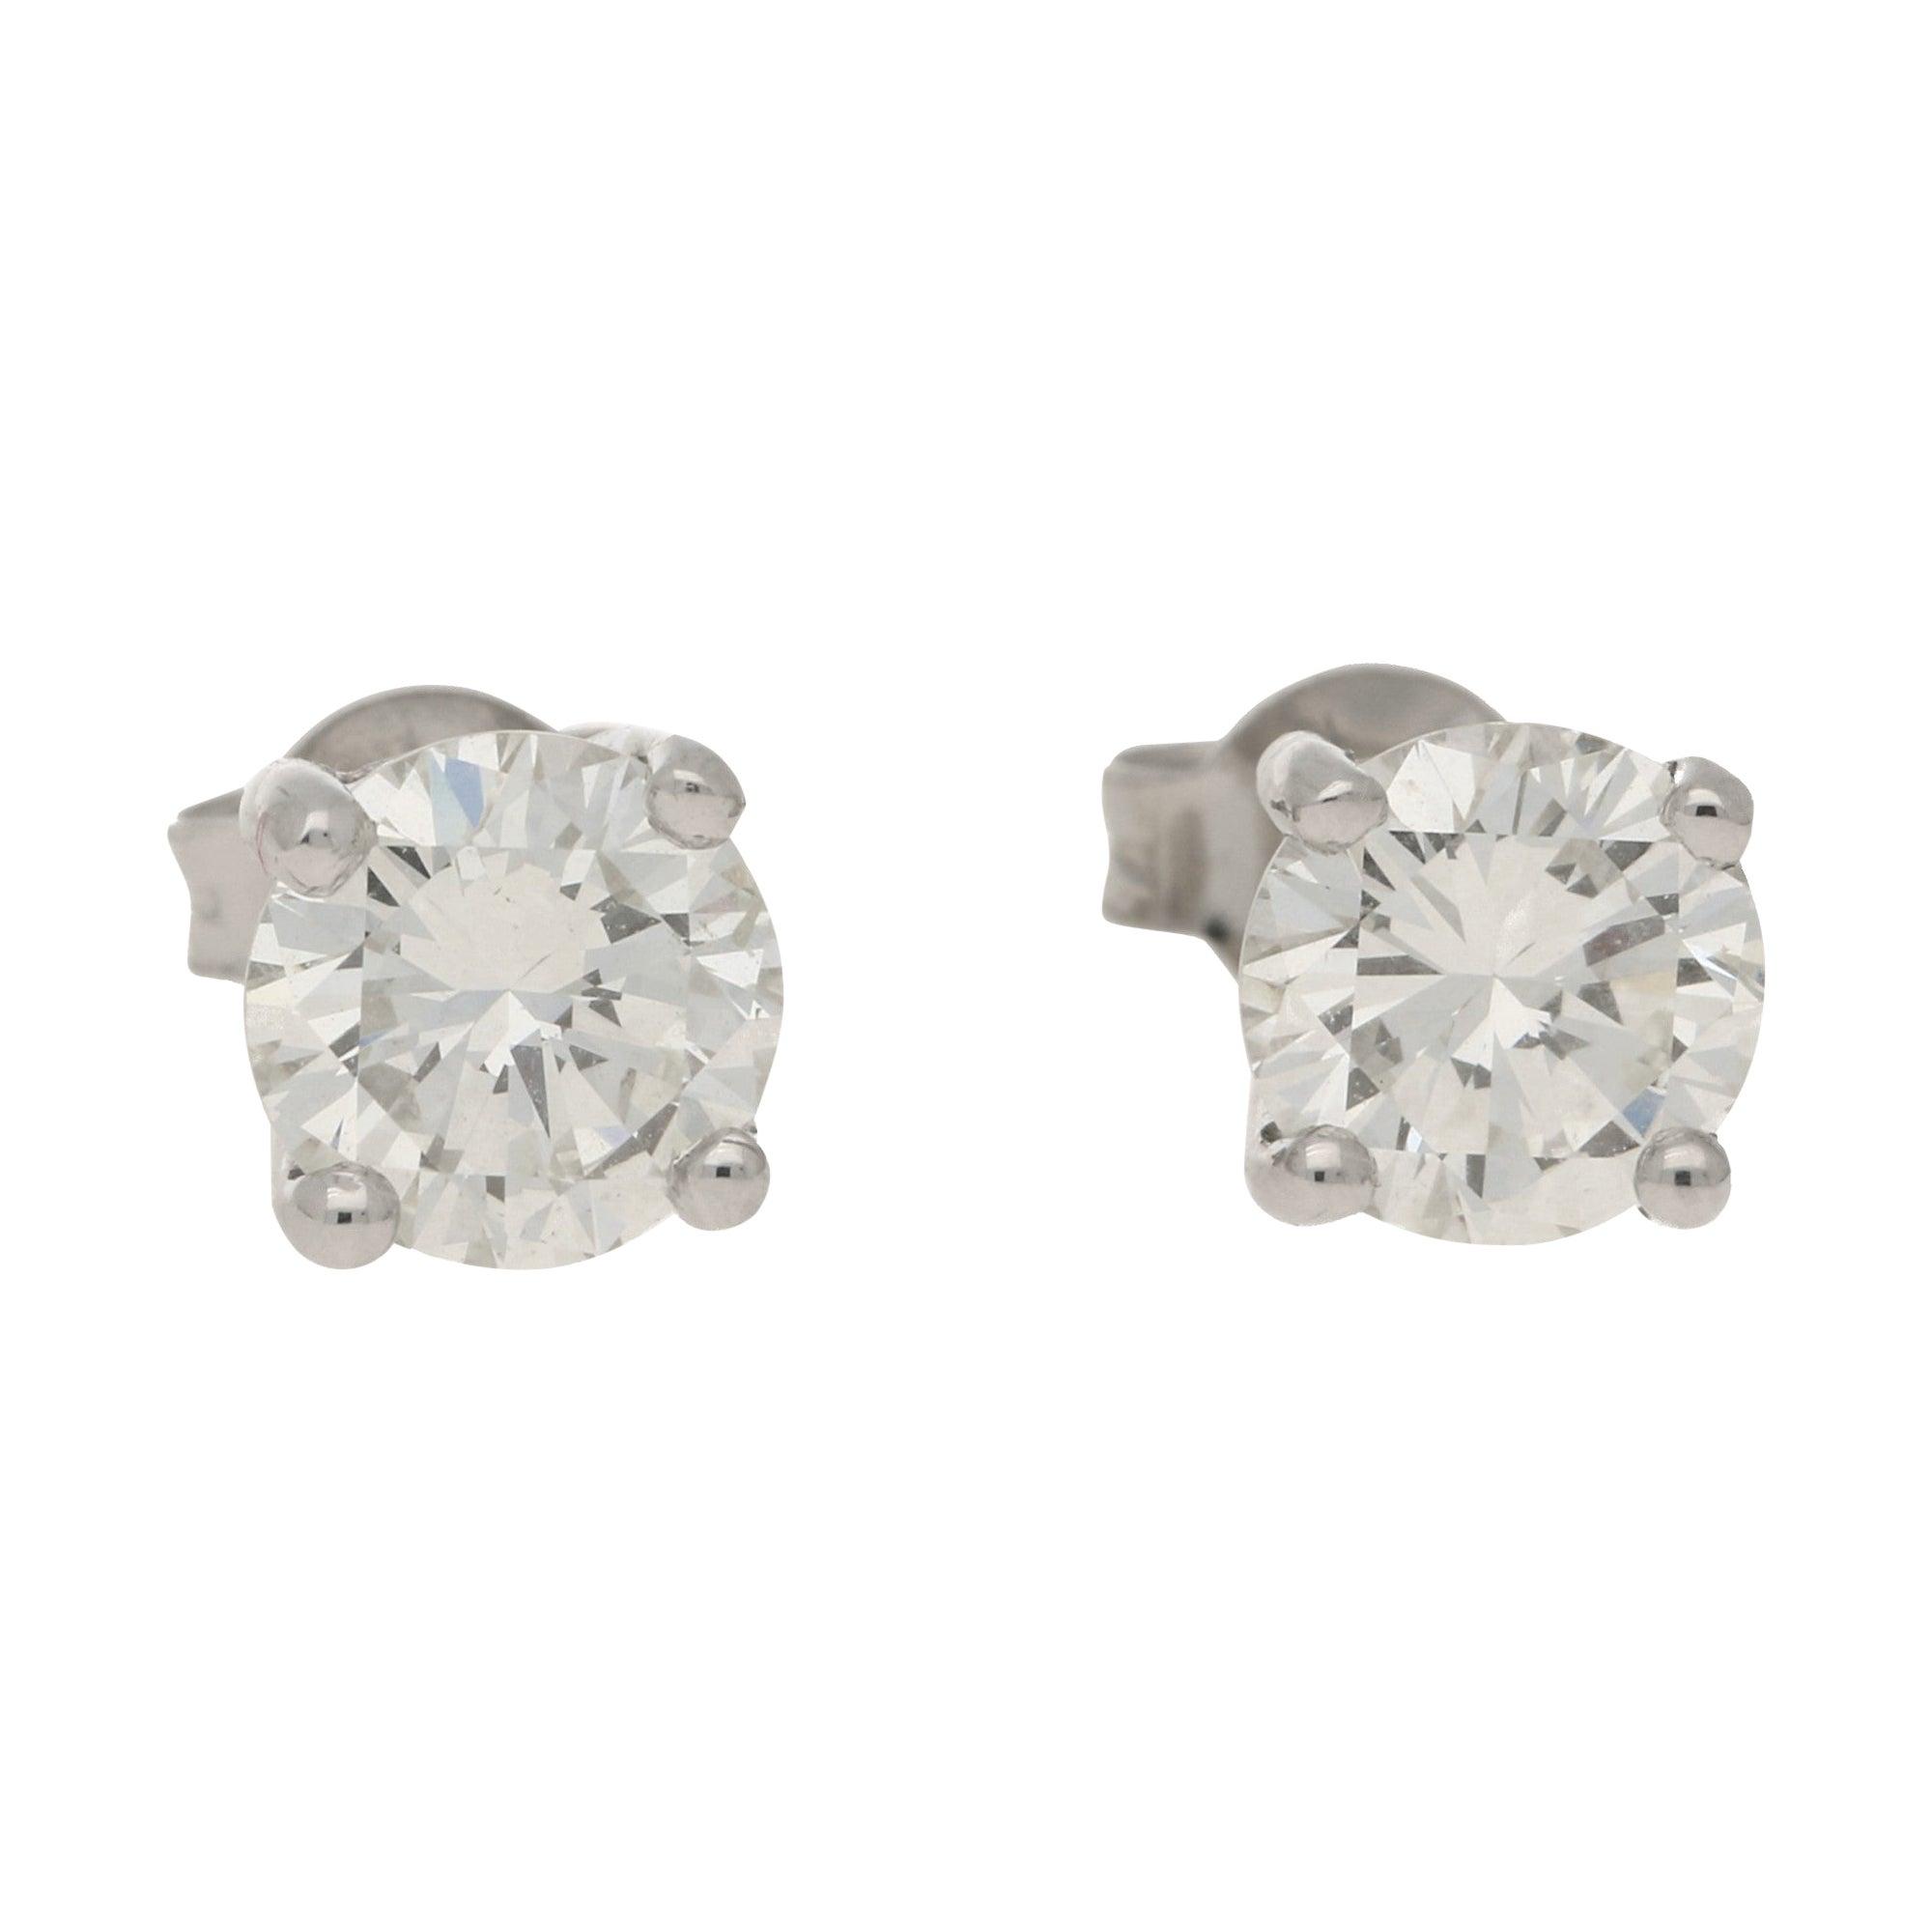 Diamond Stud Earrings Set in 18k White Gold 2.46 Carat